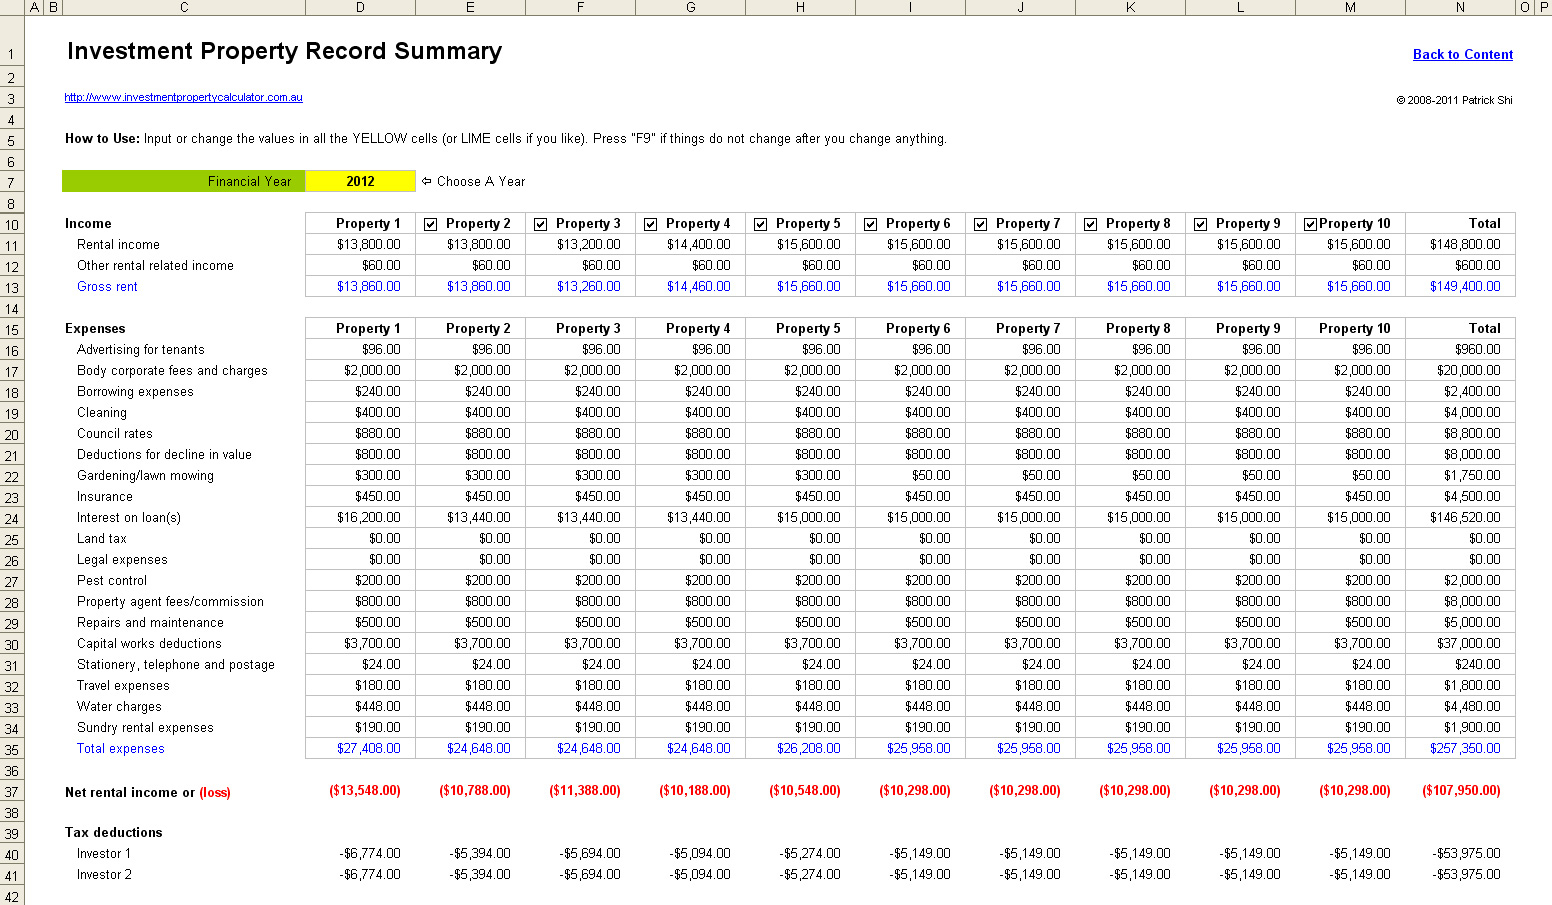 Excel Property Management Spreadsheet Pertaining To Free Rental Property Management Spreadsheet In Excel